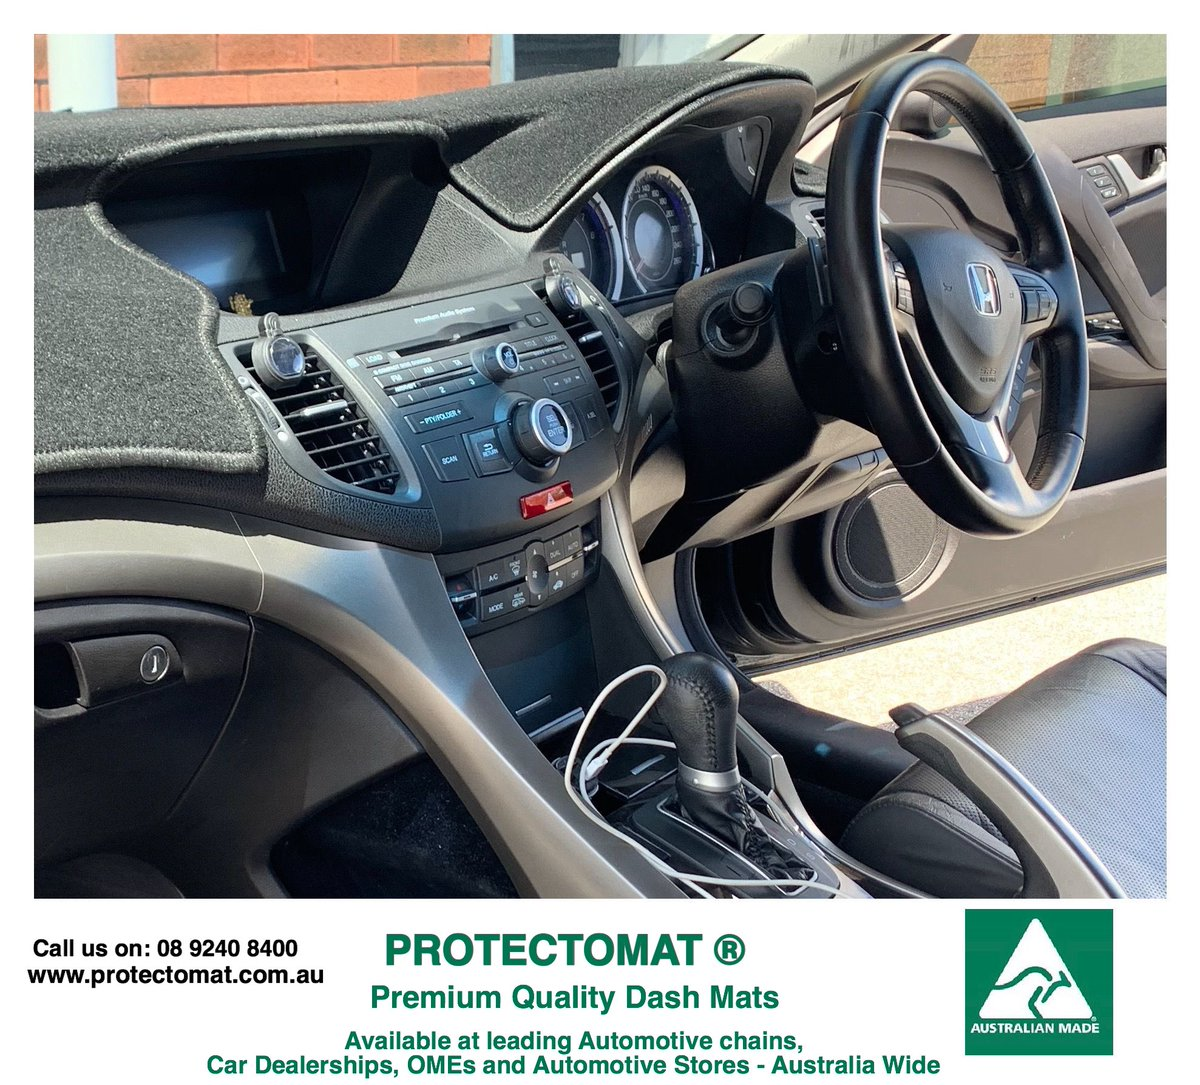 Dashmat 71840-00-25 VelourMat Dashboard Cover for Dodge RAM Black